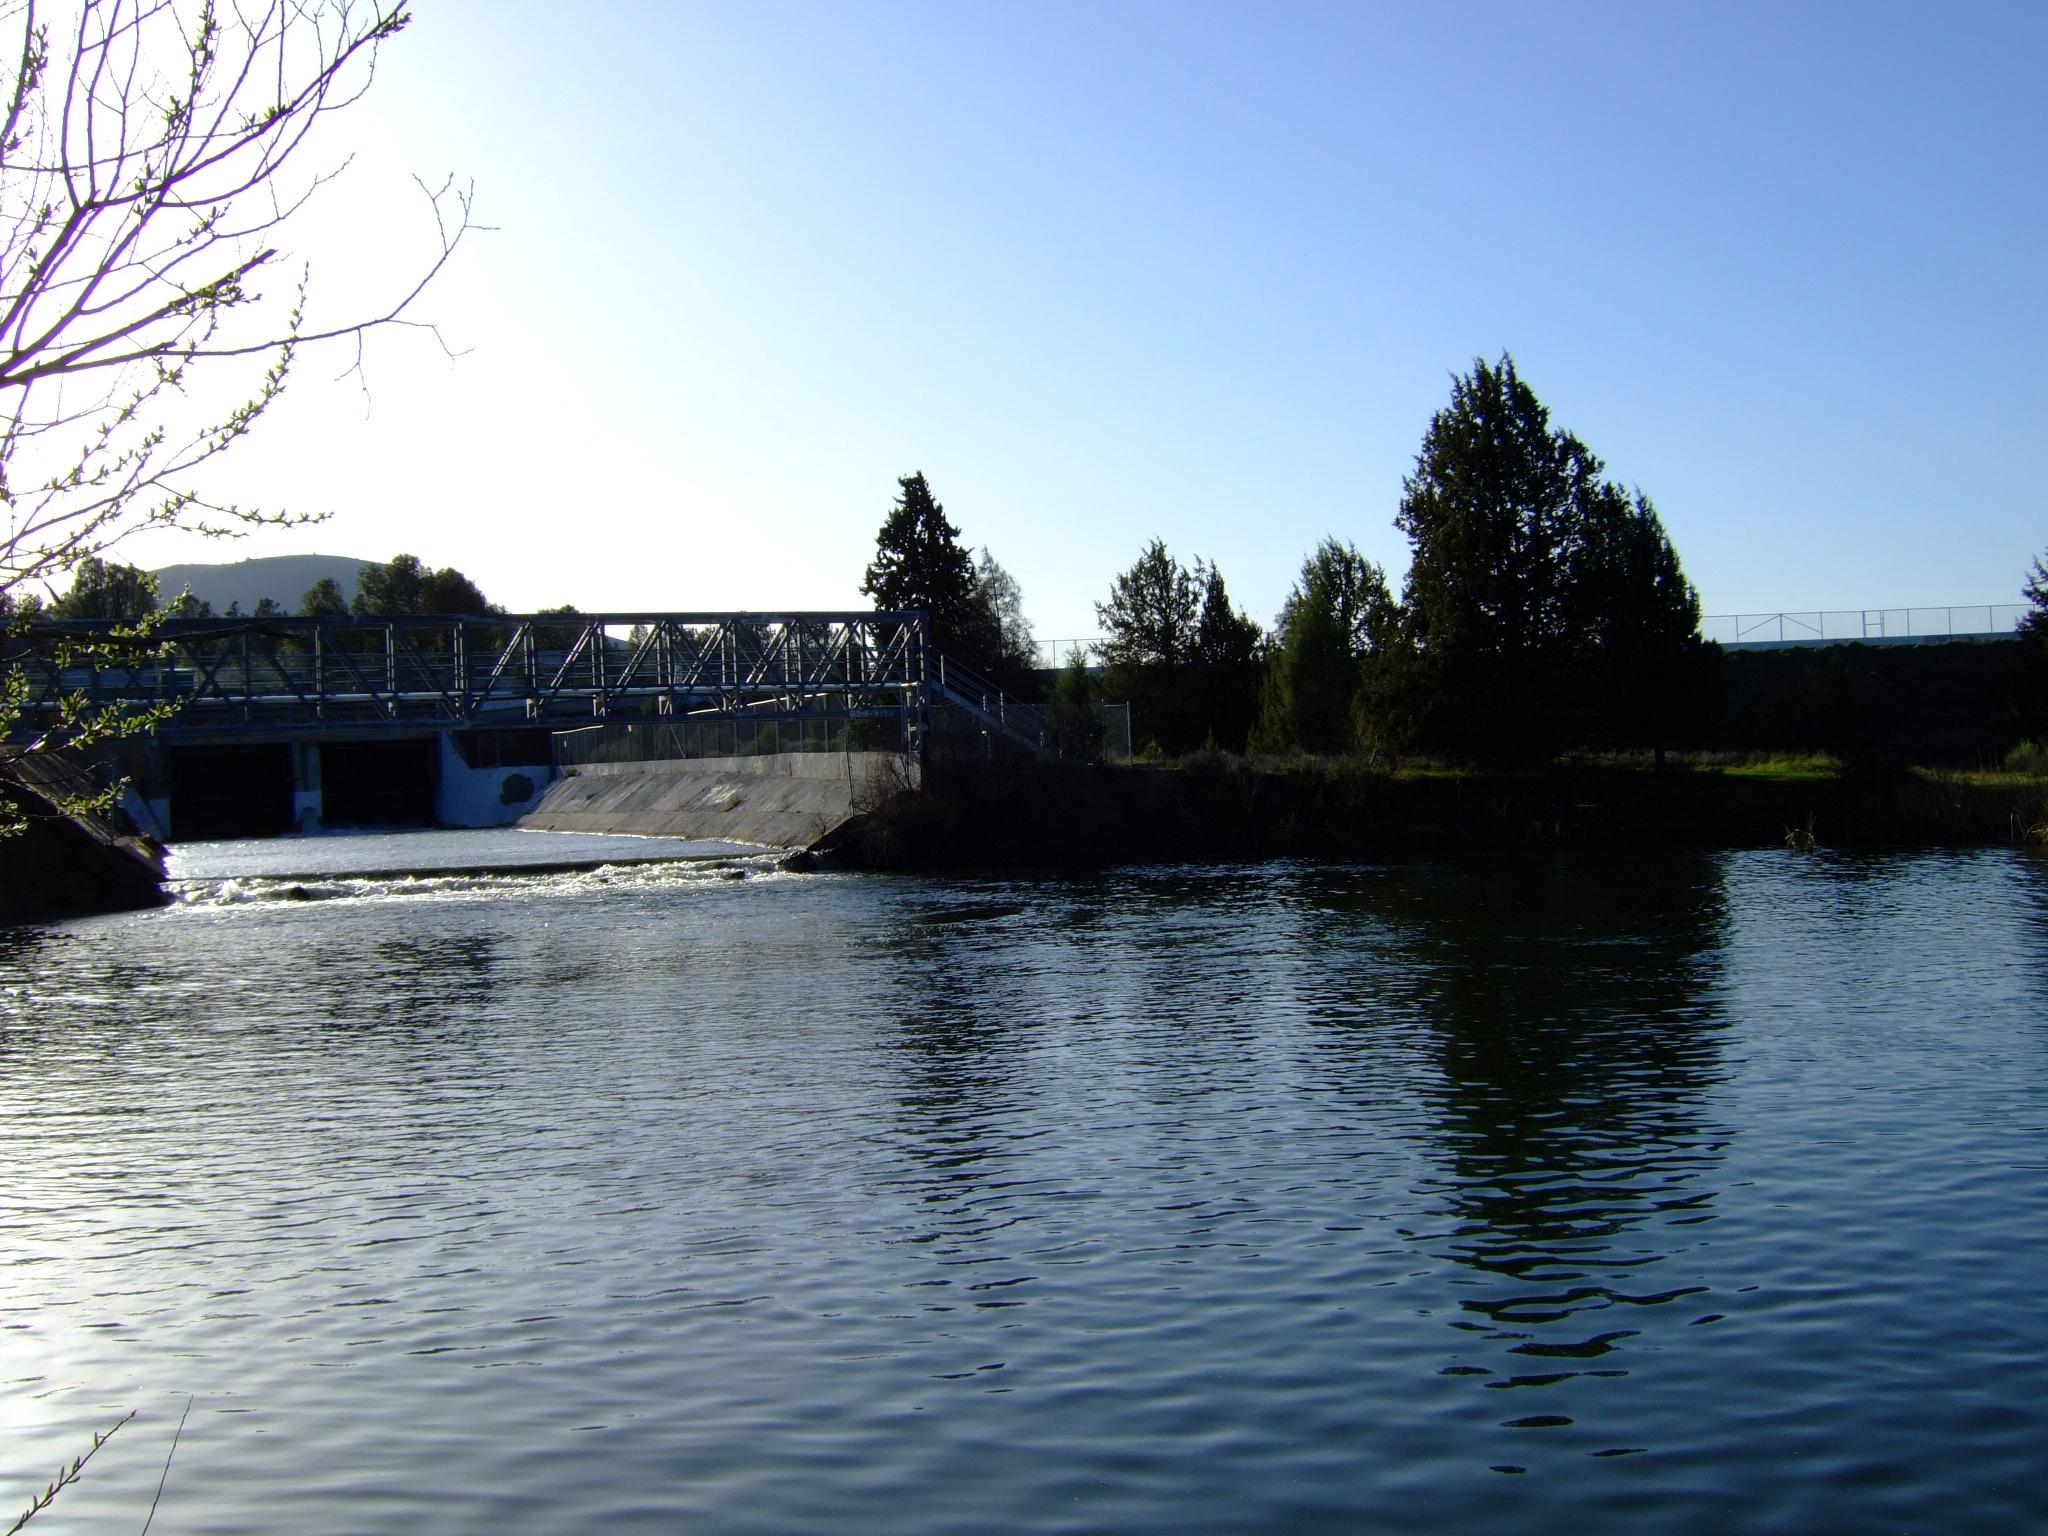 File:Fall River Dam.JPG - Wikimedia Commons